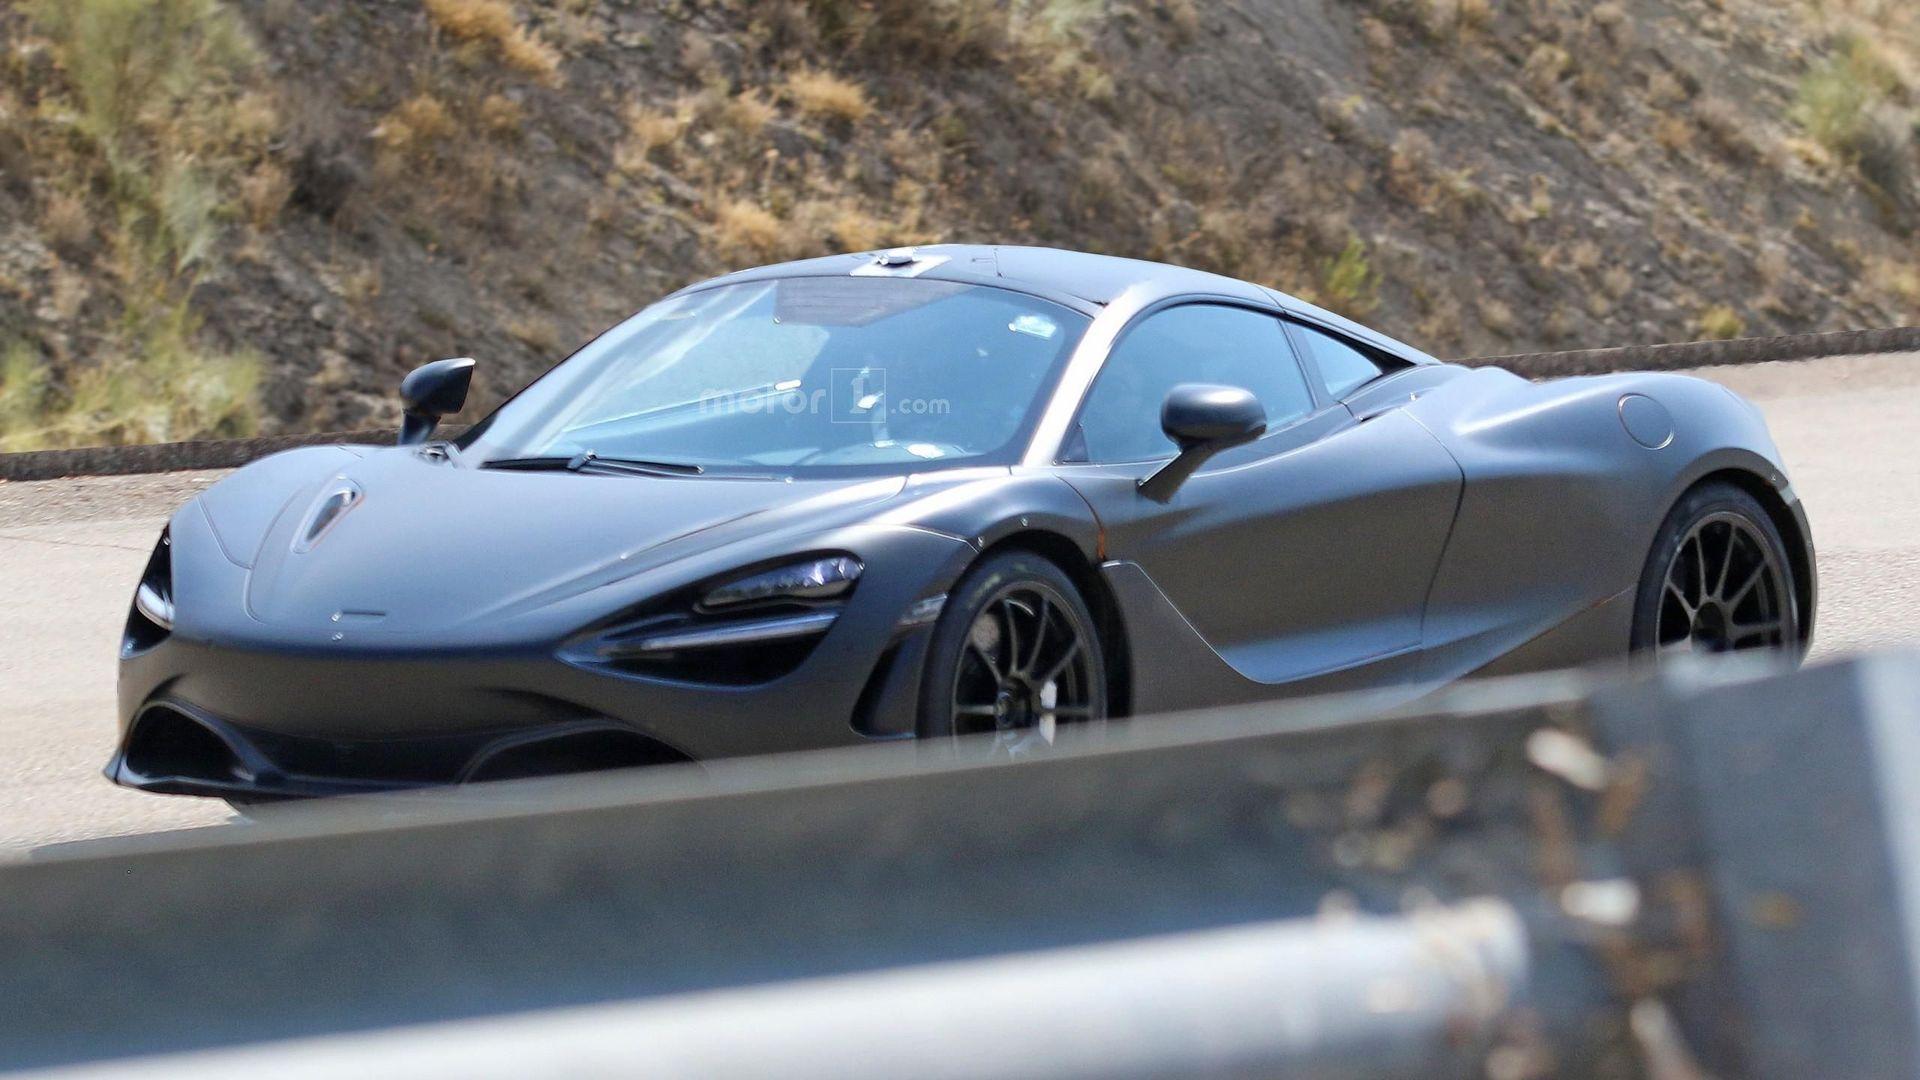 & McLaren 650S replacement teases its aerodynamic efficiency